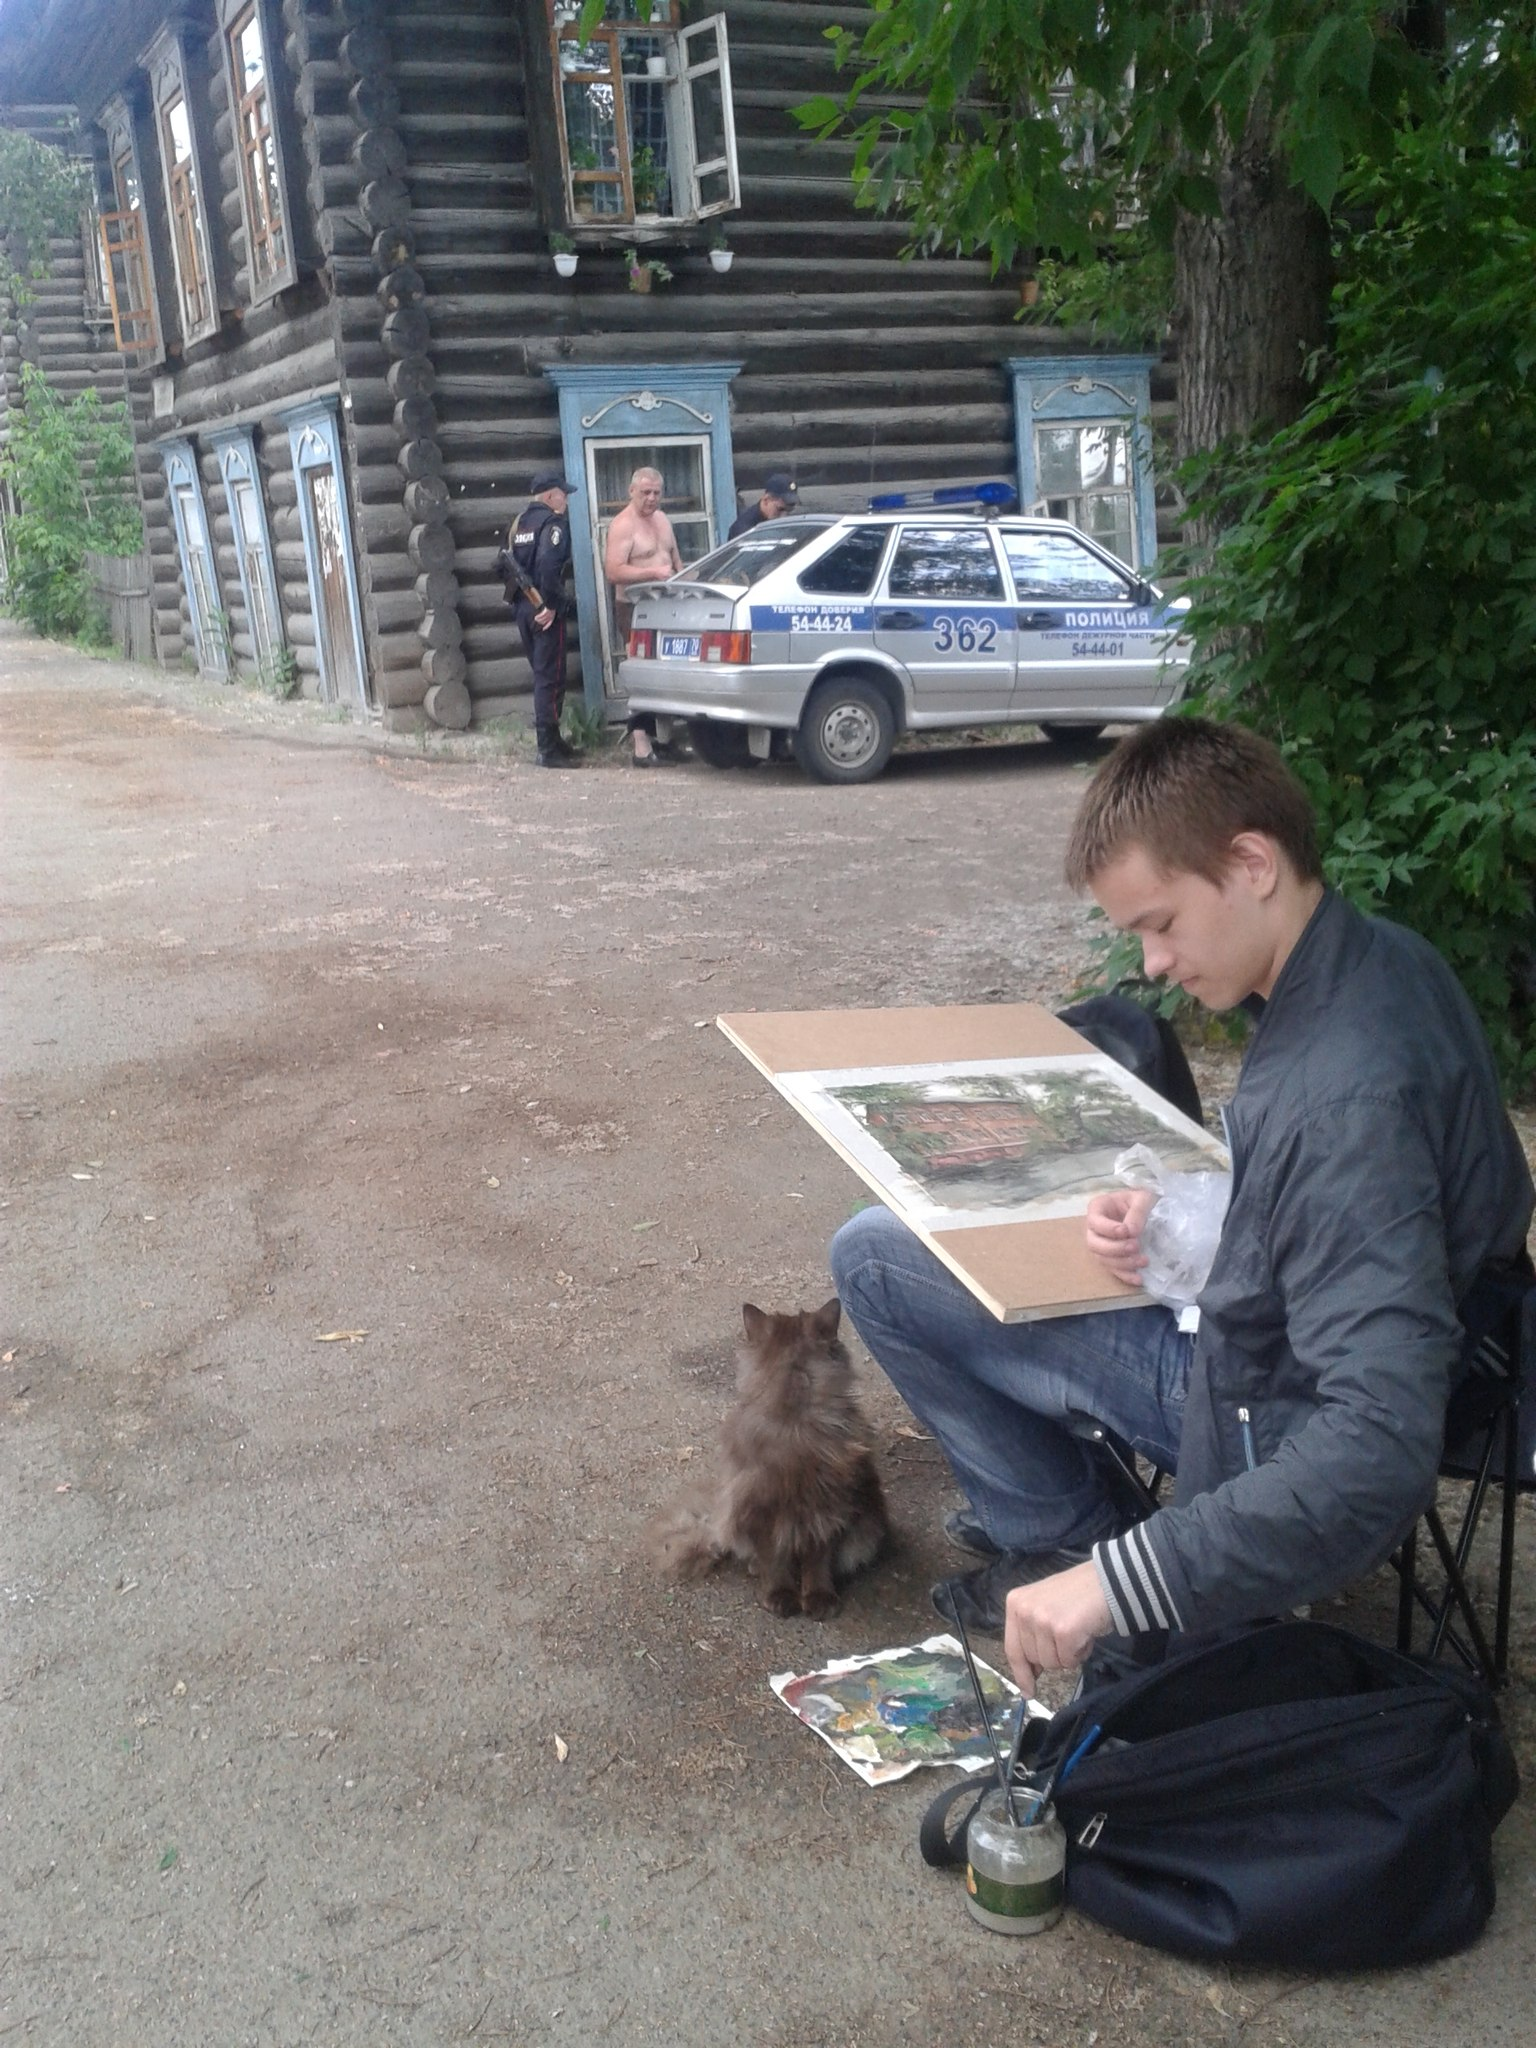 http://savepic.ru/7891117.jpg